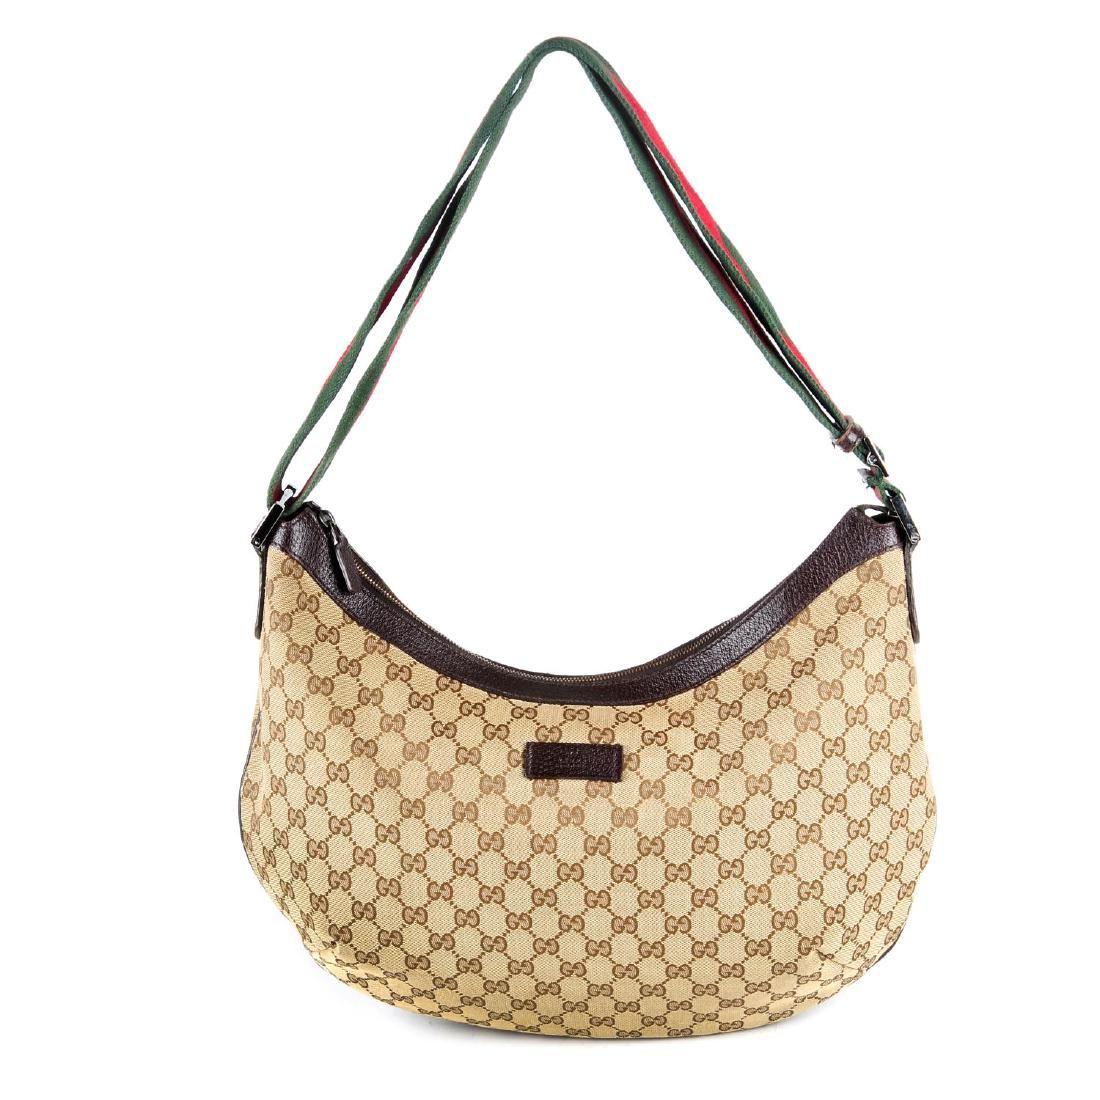 GUCCI - a Monogram Web messenger handbag. Crafted from